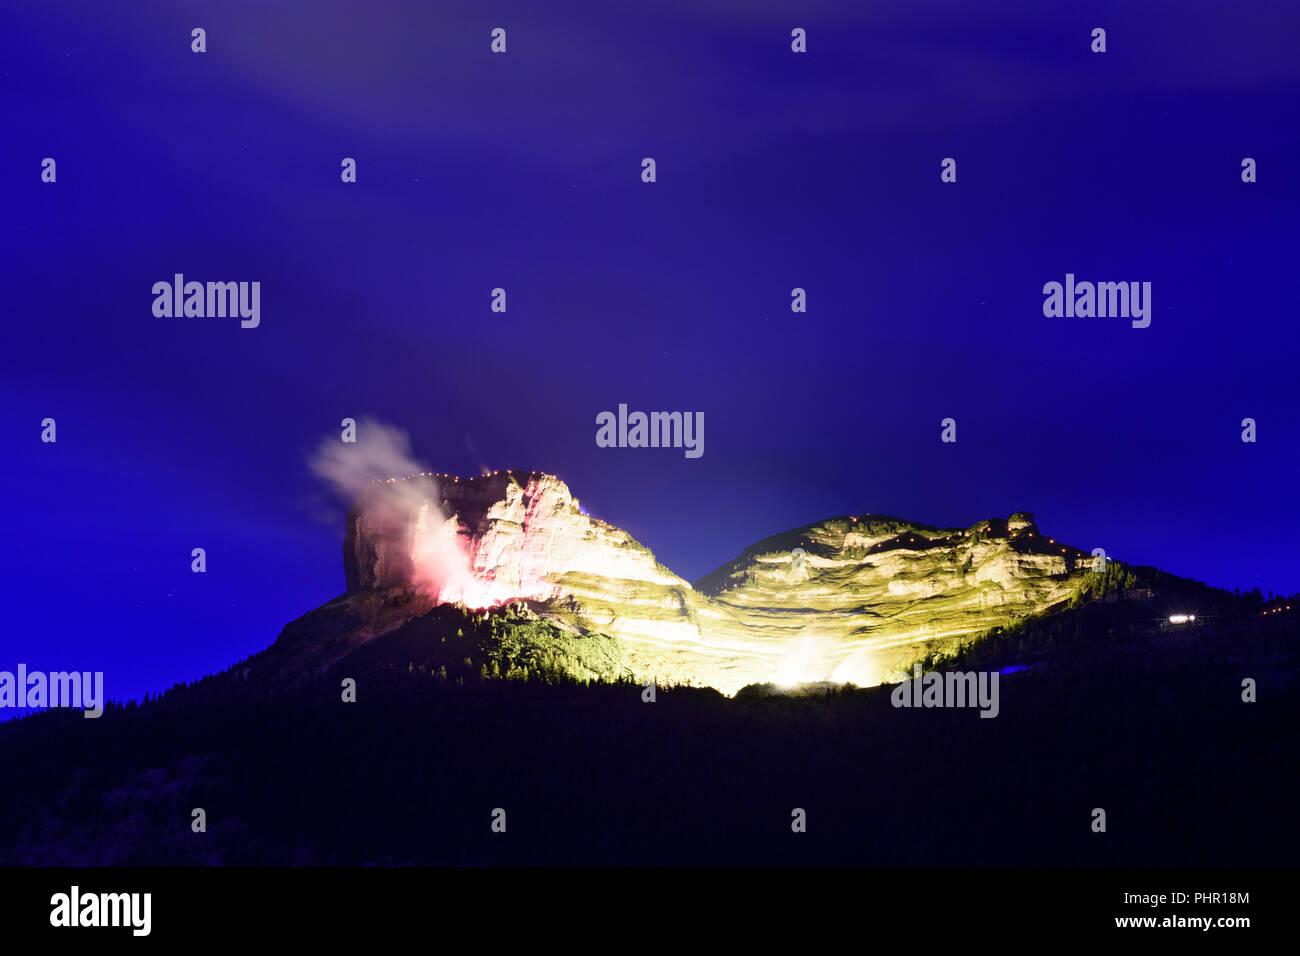 Altaussee: illuminated mountain Loser  at festival 'Berge in Flammen' (mountains in flames), Ausseerland-Salzkammergut, Steiermark, Styria, Austria - Stock Image